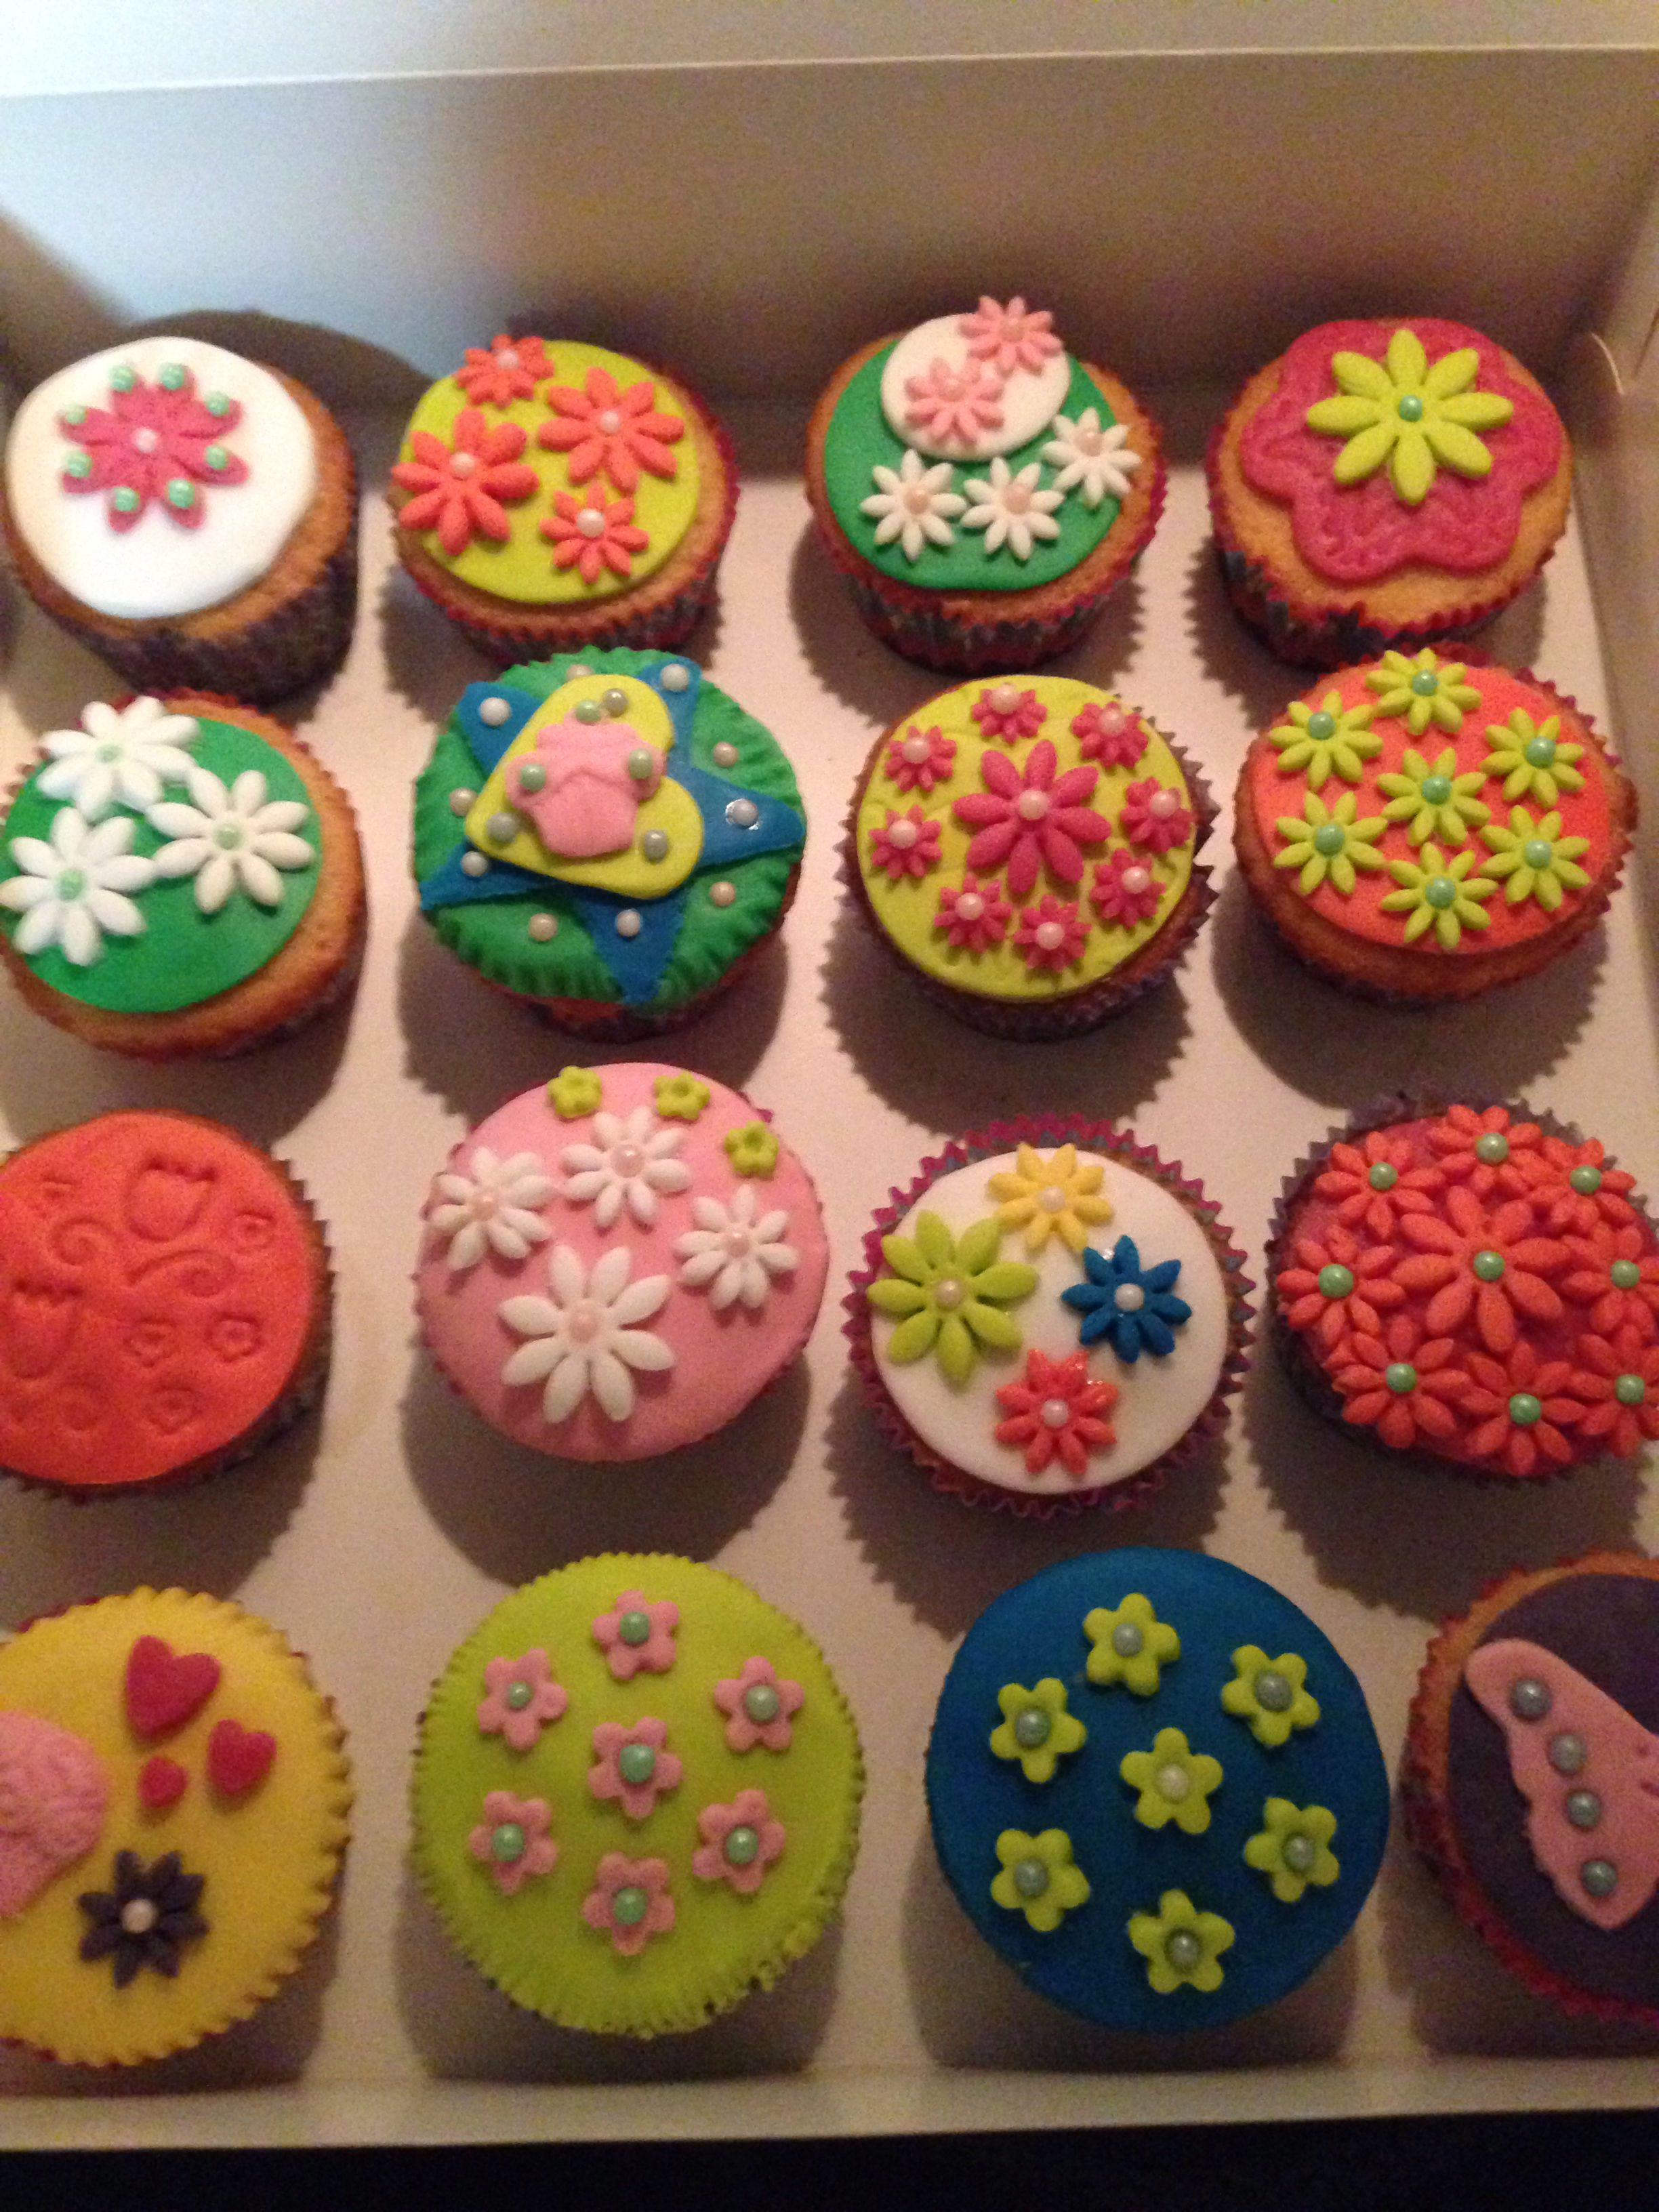 Vanilla cupcakes with sugar flowers